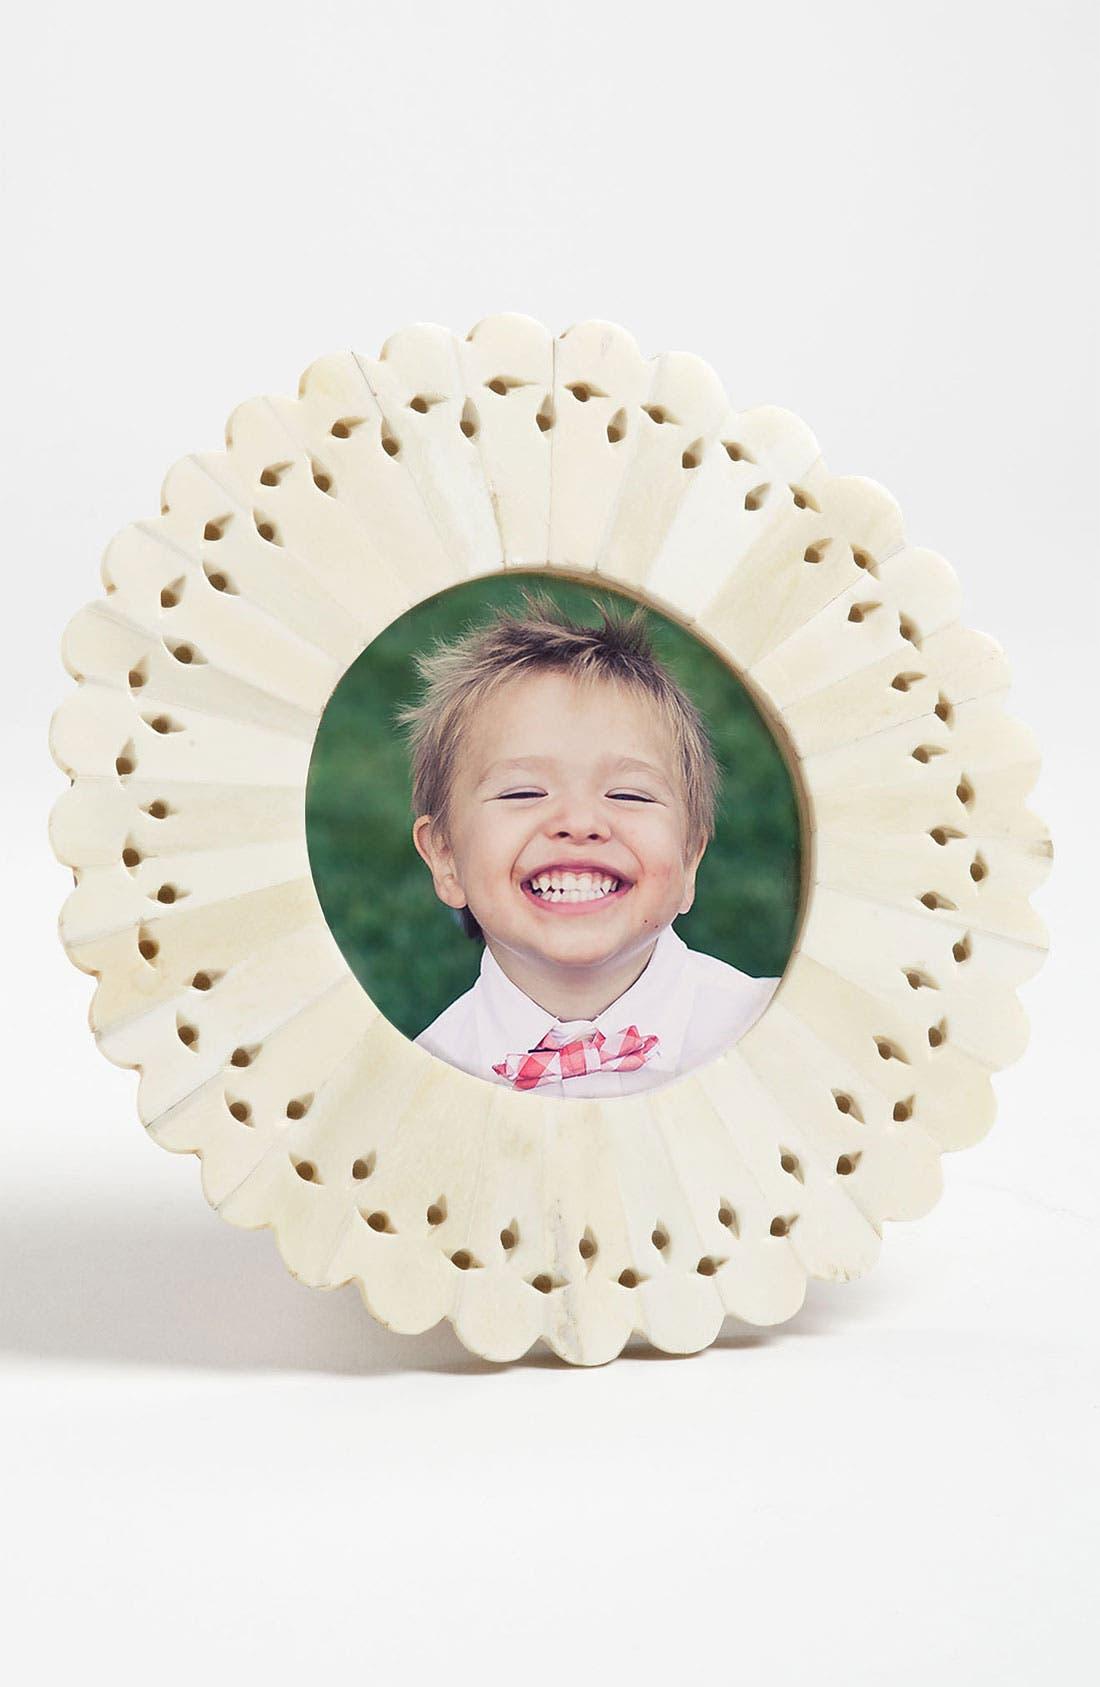 Main Image - Circular Photo Frame (4x4)